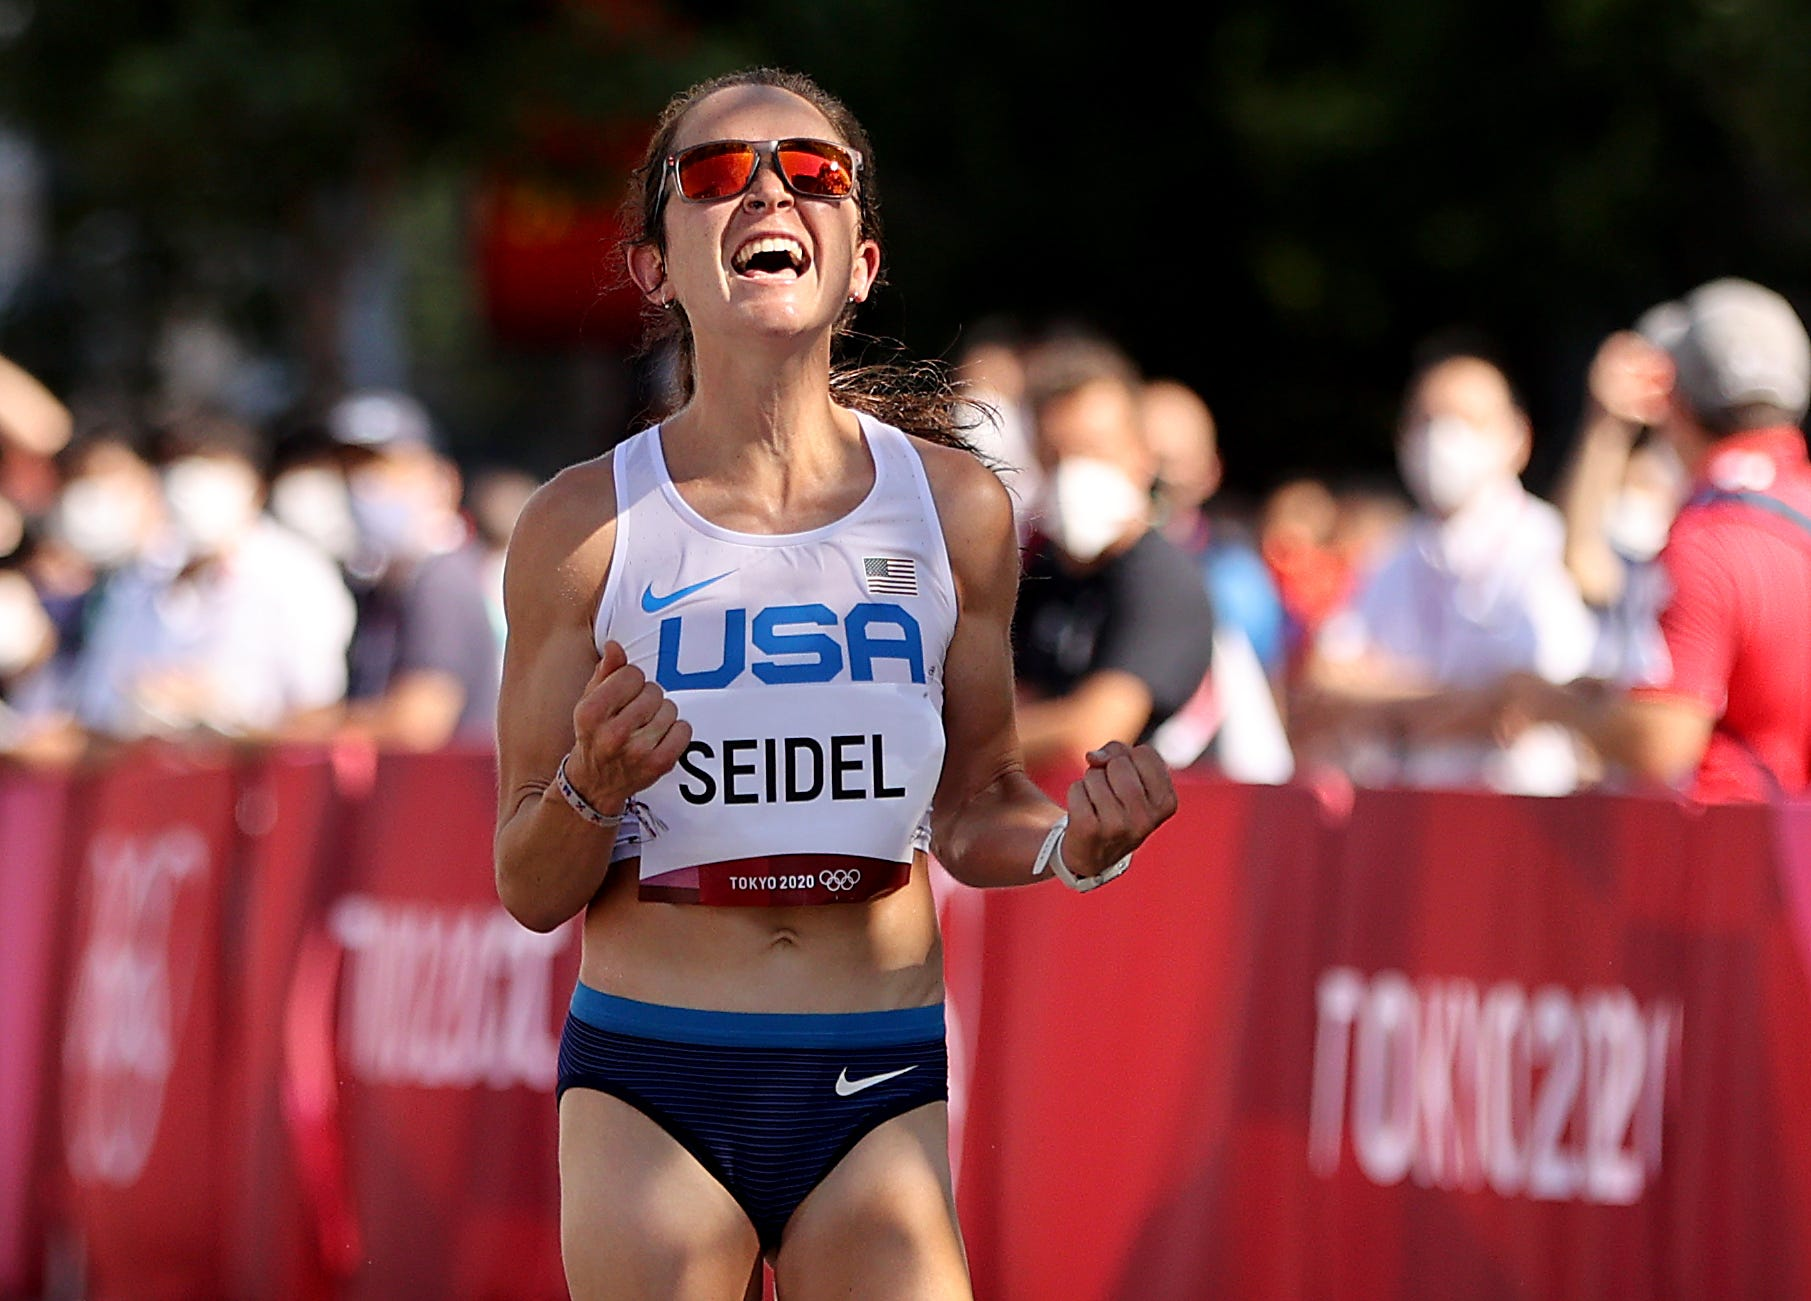 Molly Seidel